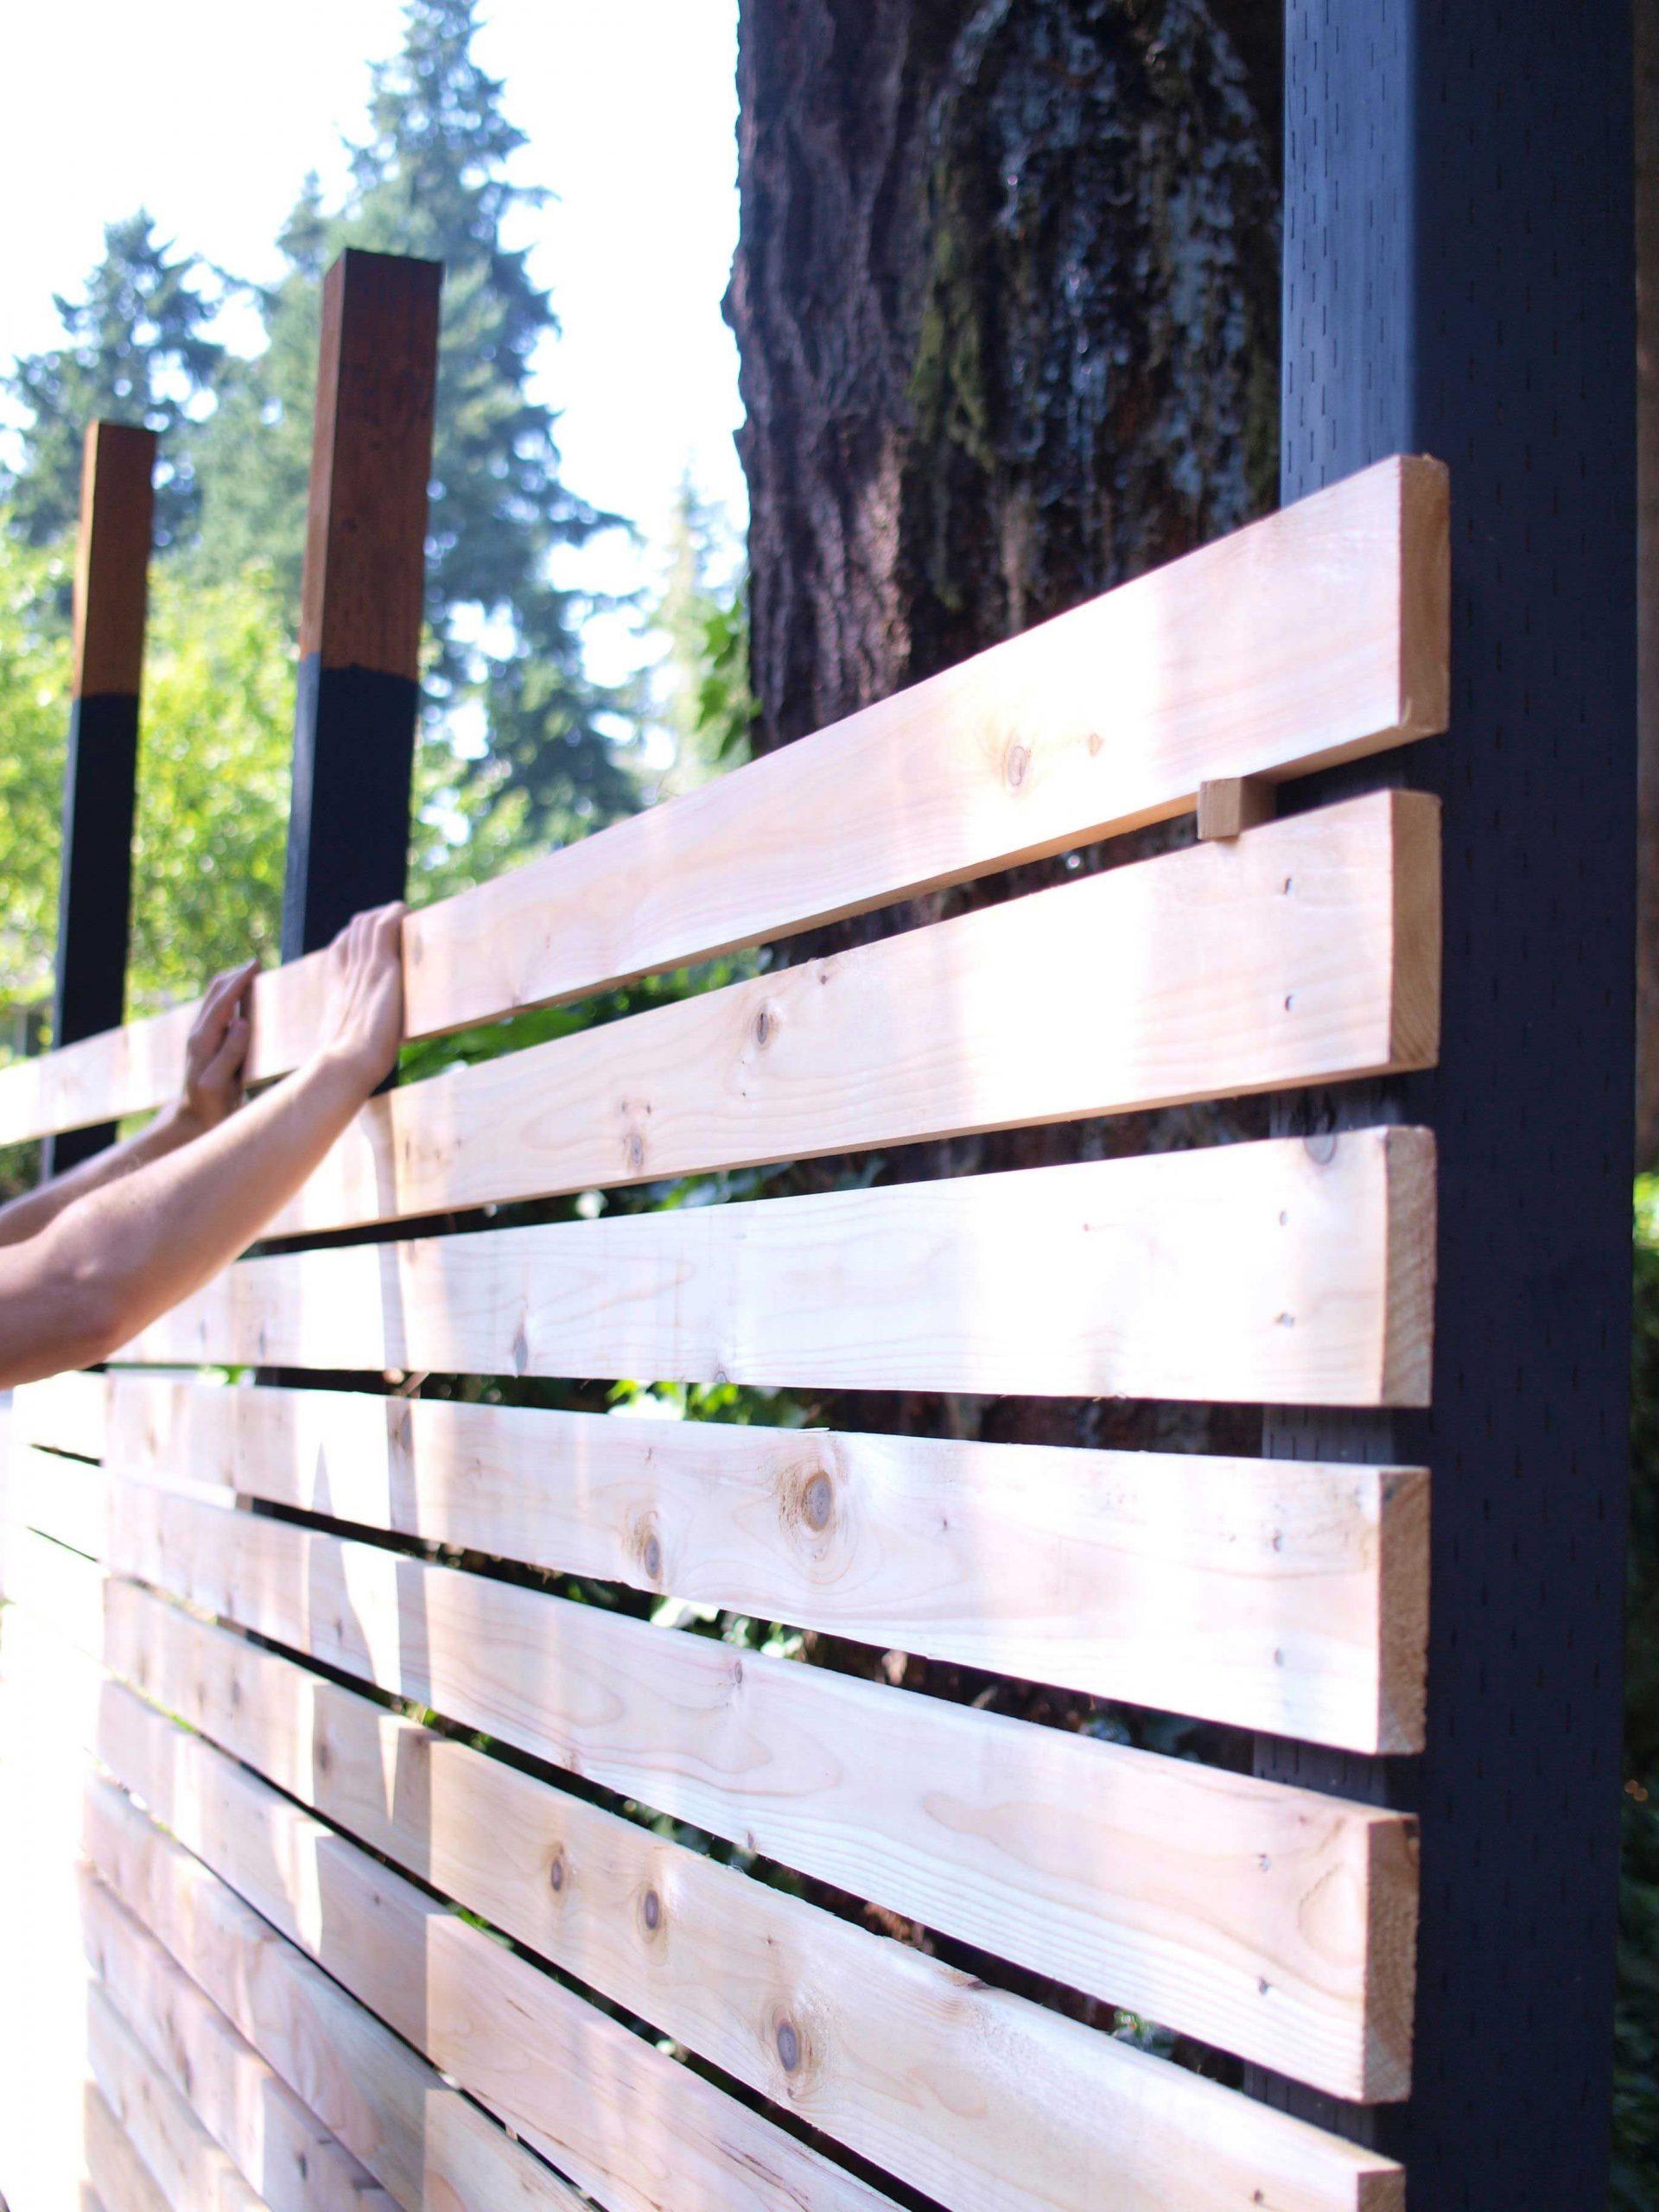 How To Build A Diy Backyard Fence, Part Ii | Cloture Jardin ... avec Separation De Jardin